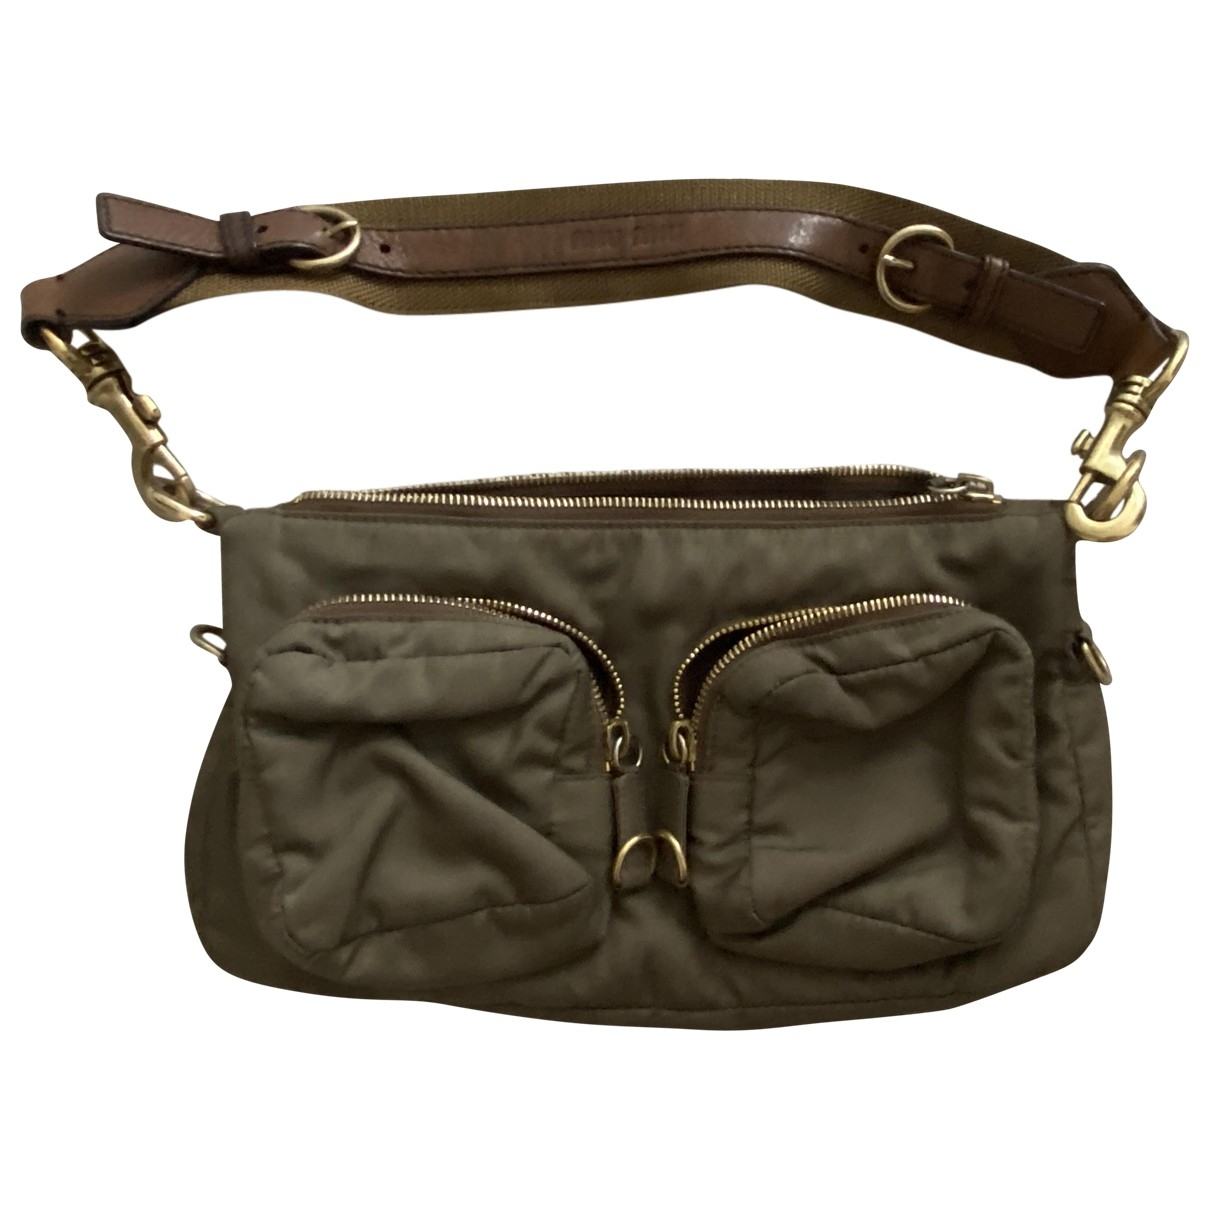 Miu Miu \N Handtasche in  Gruen Leinen